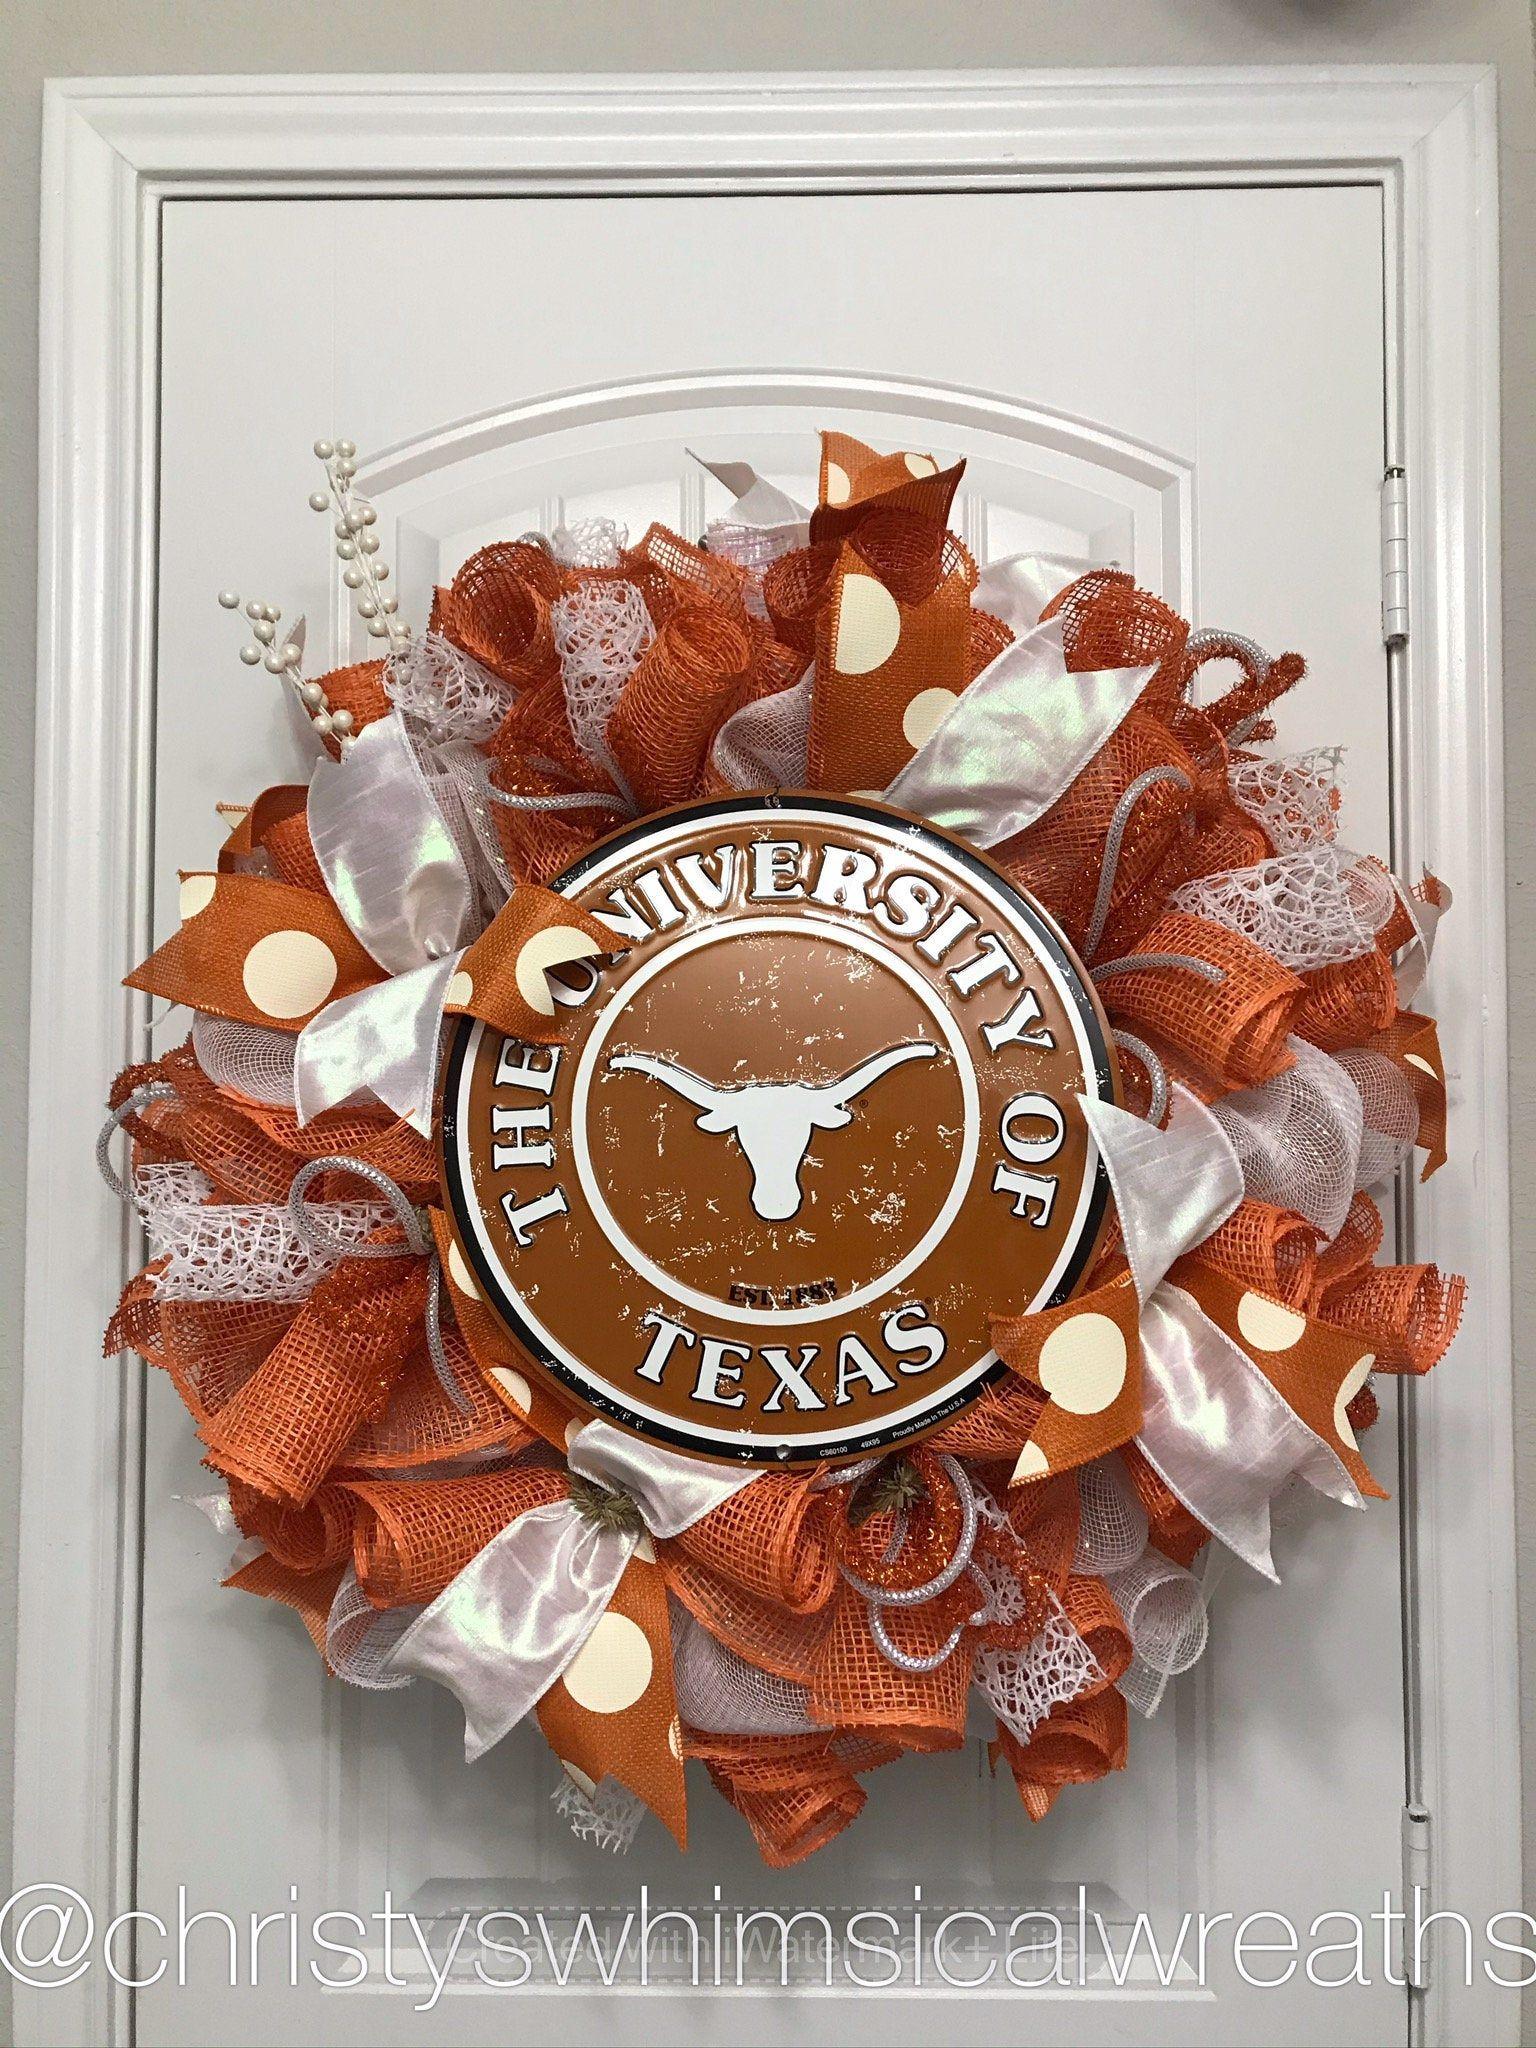 University Of Texas Wreath Longhorn Wreath College Wreath Etsy In 2020 Whimsical Wreaths Sports Wreaths Orange Wreath